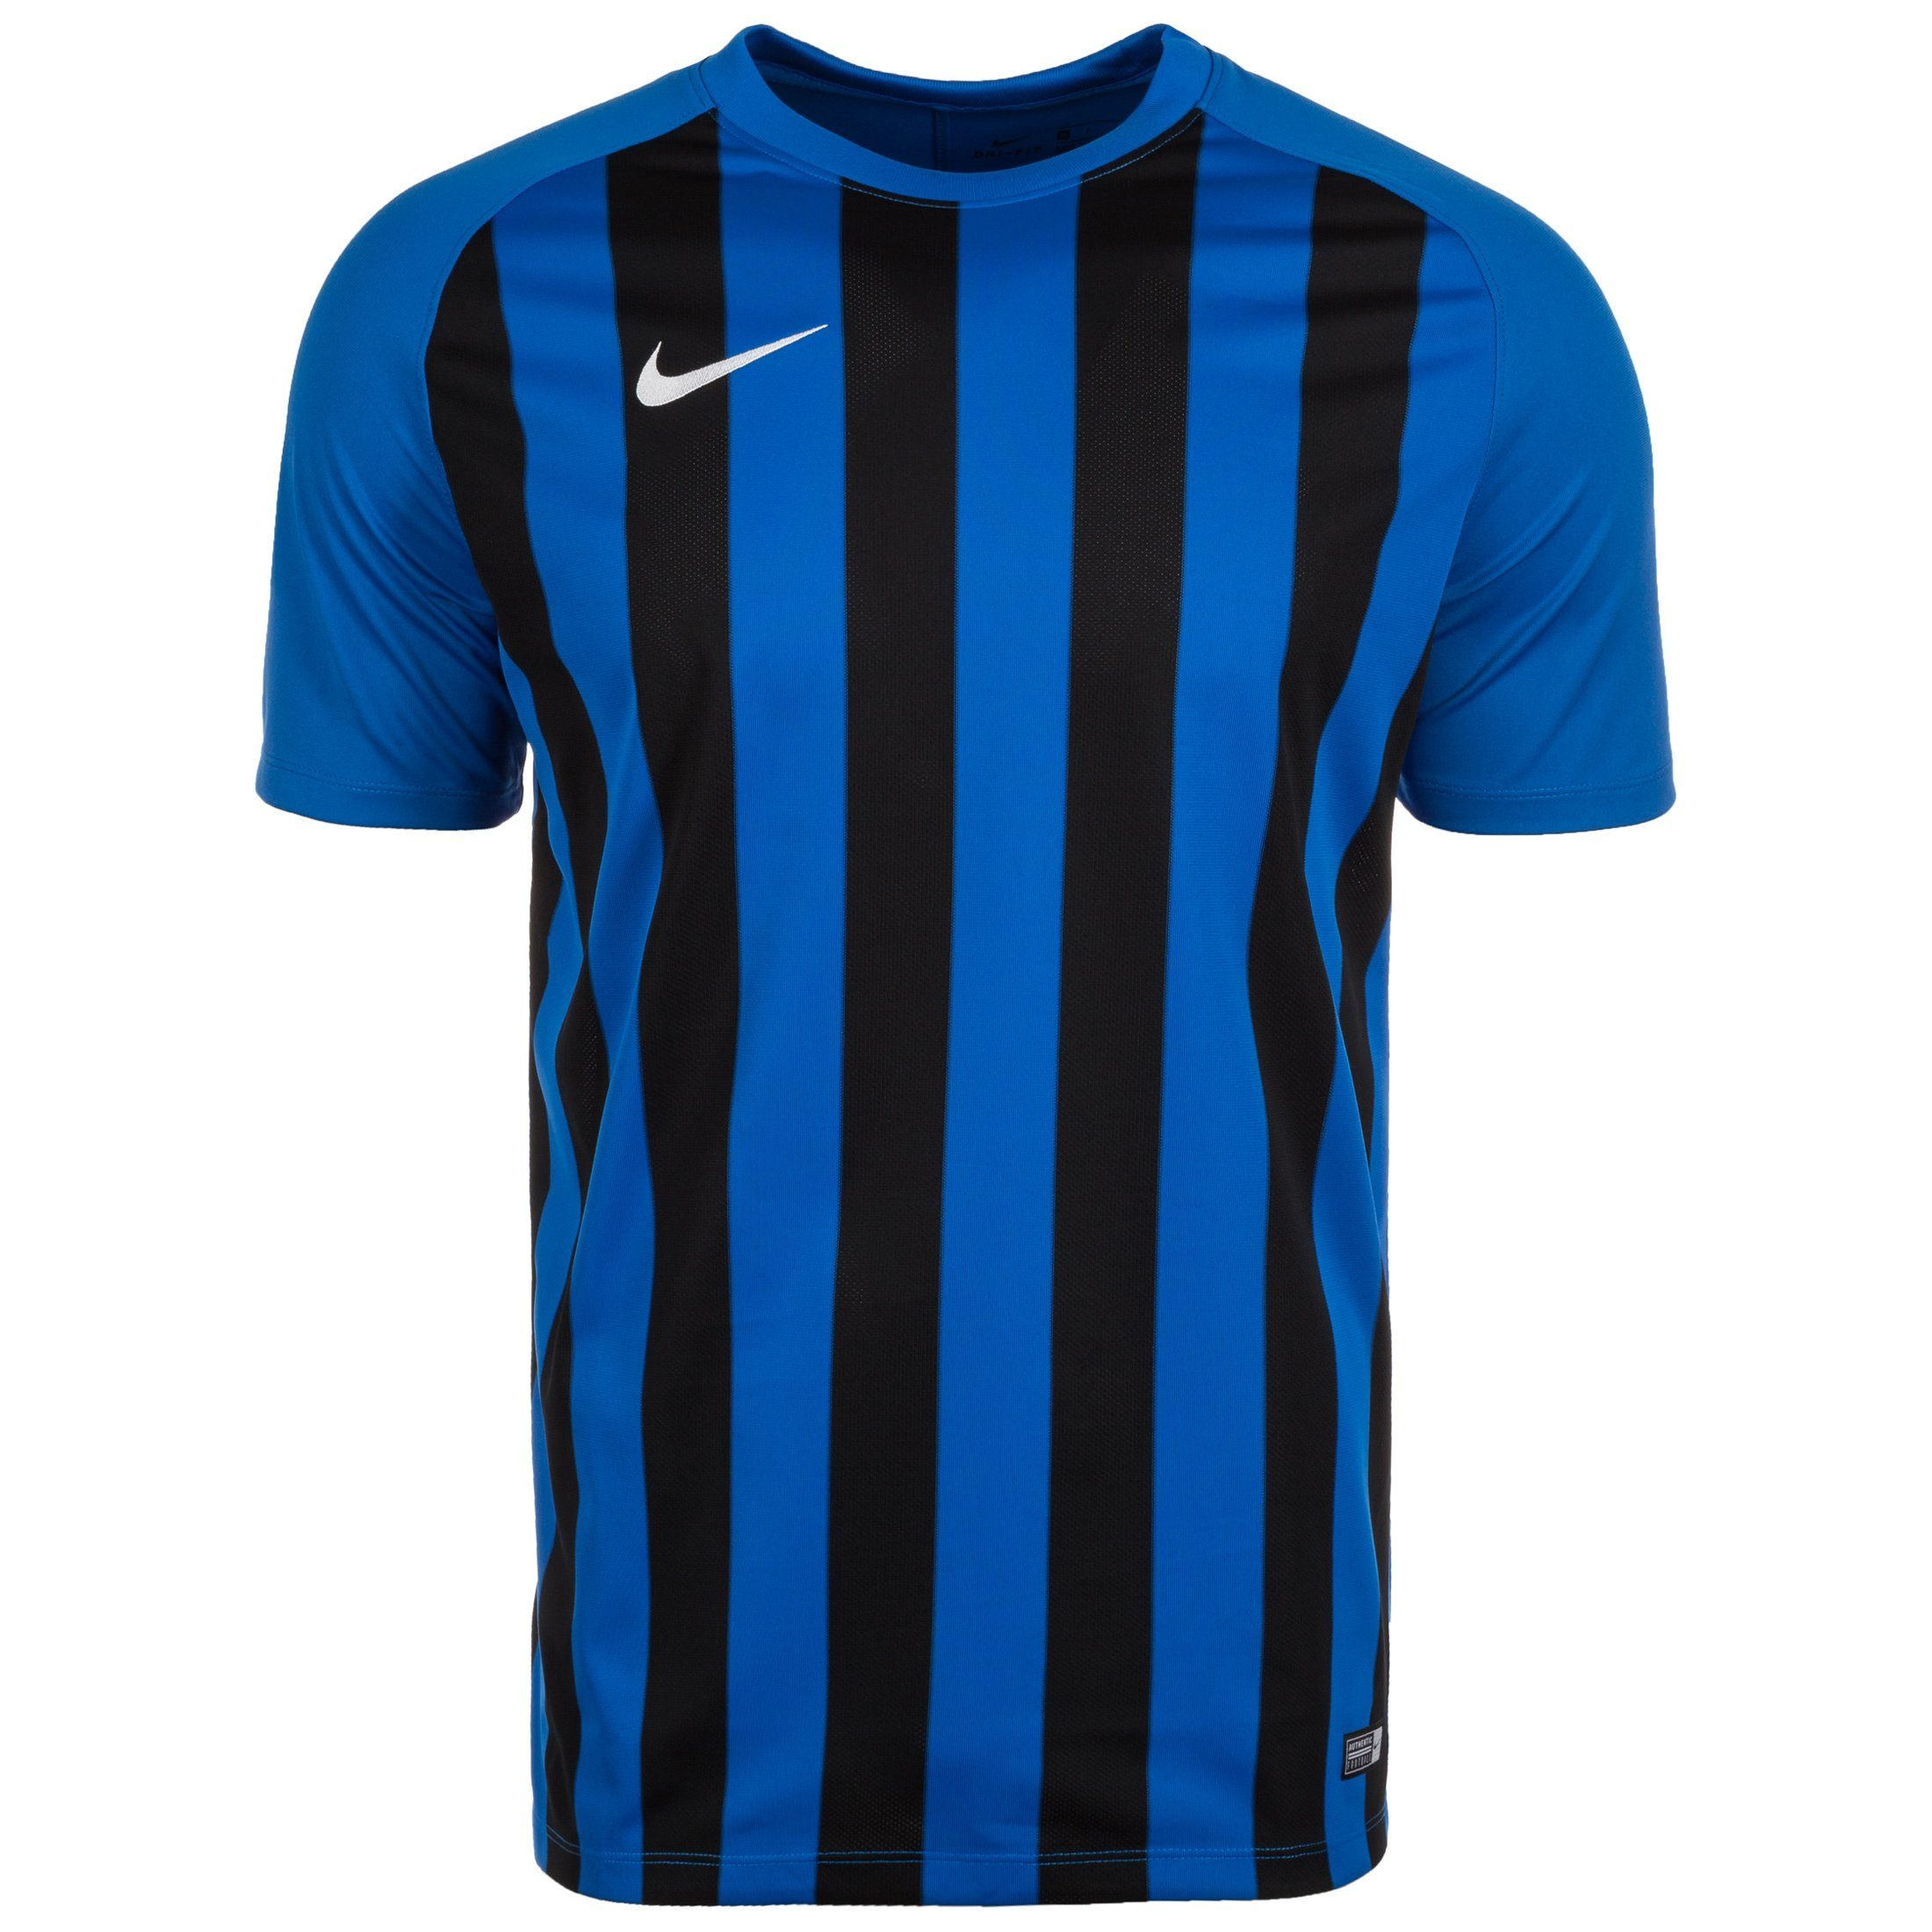 Nike Fußballtrikot Dry Striped Segment Iii | Sportbekleidung > Trikots > Fußballtrikots | Blau | Ab | Nike